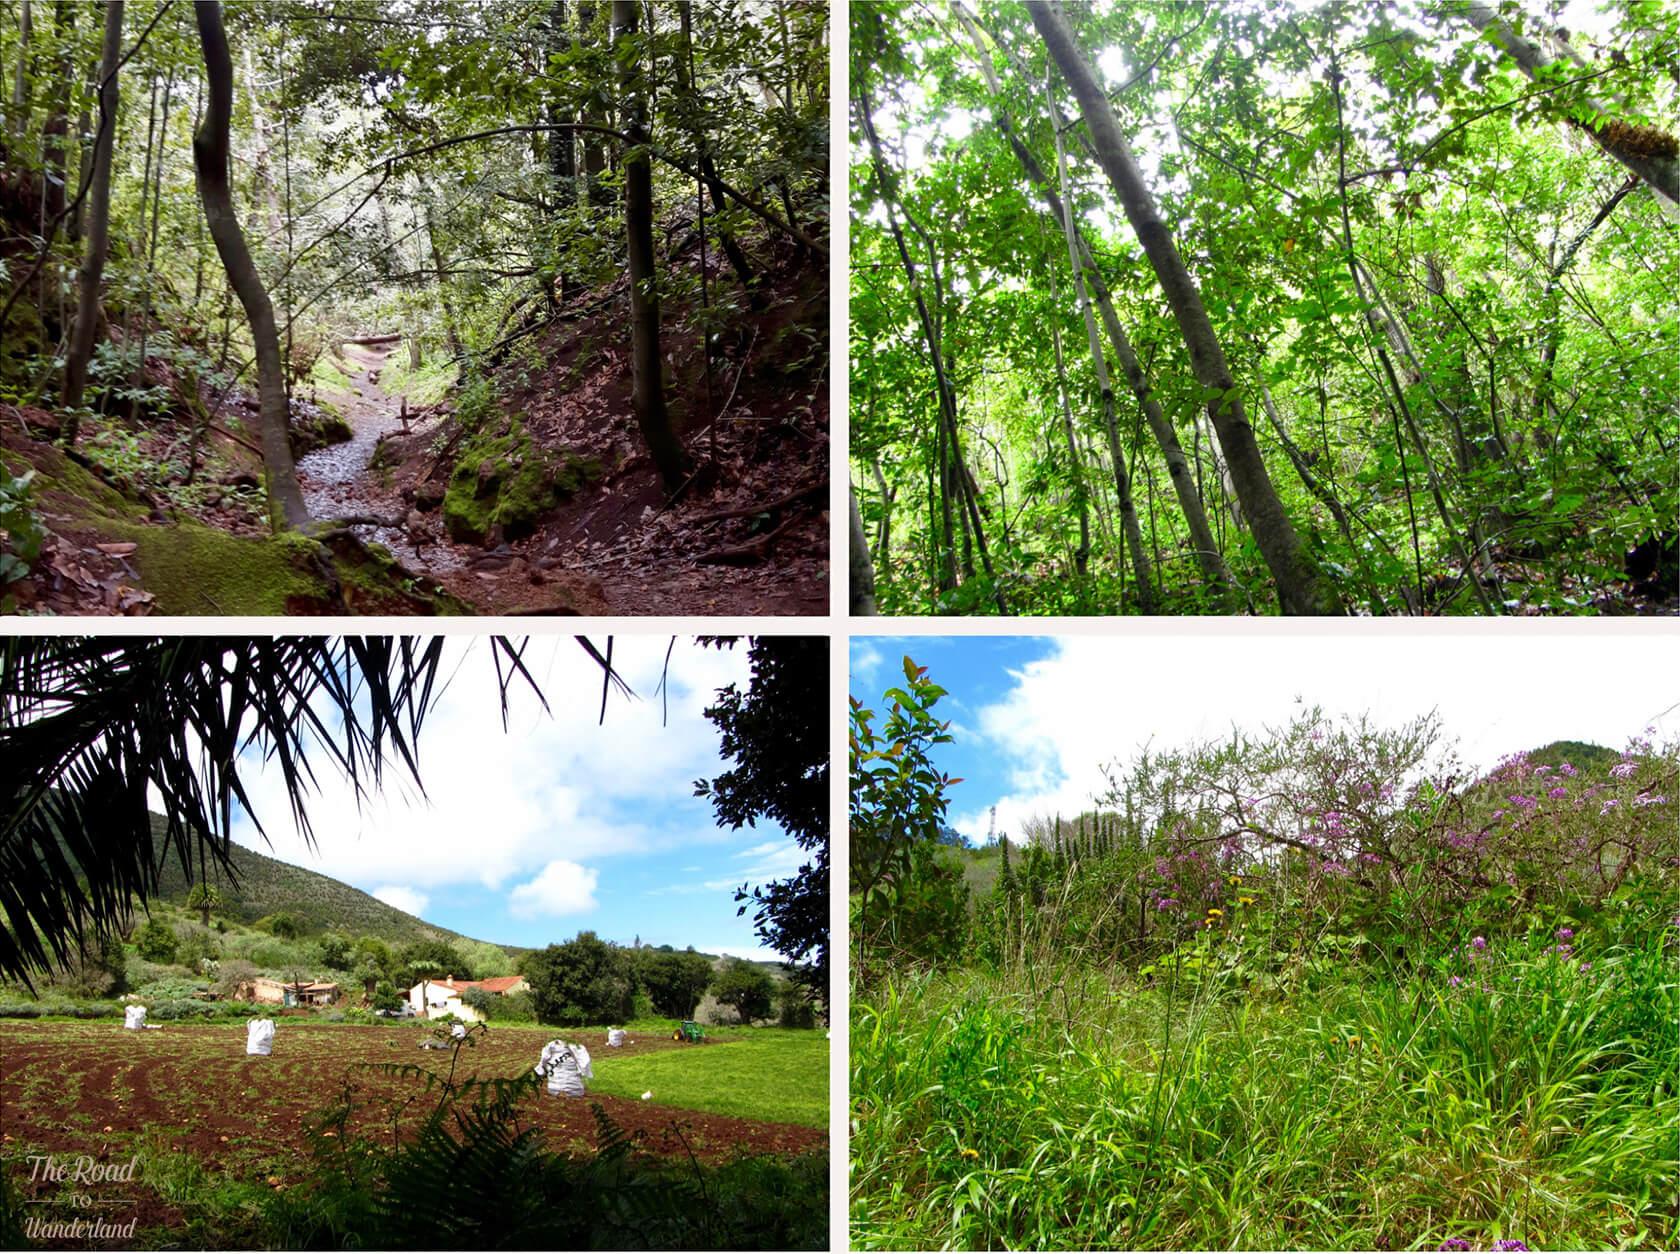 Landscapes at the Finca de Osorio